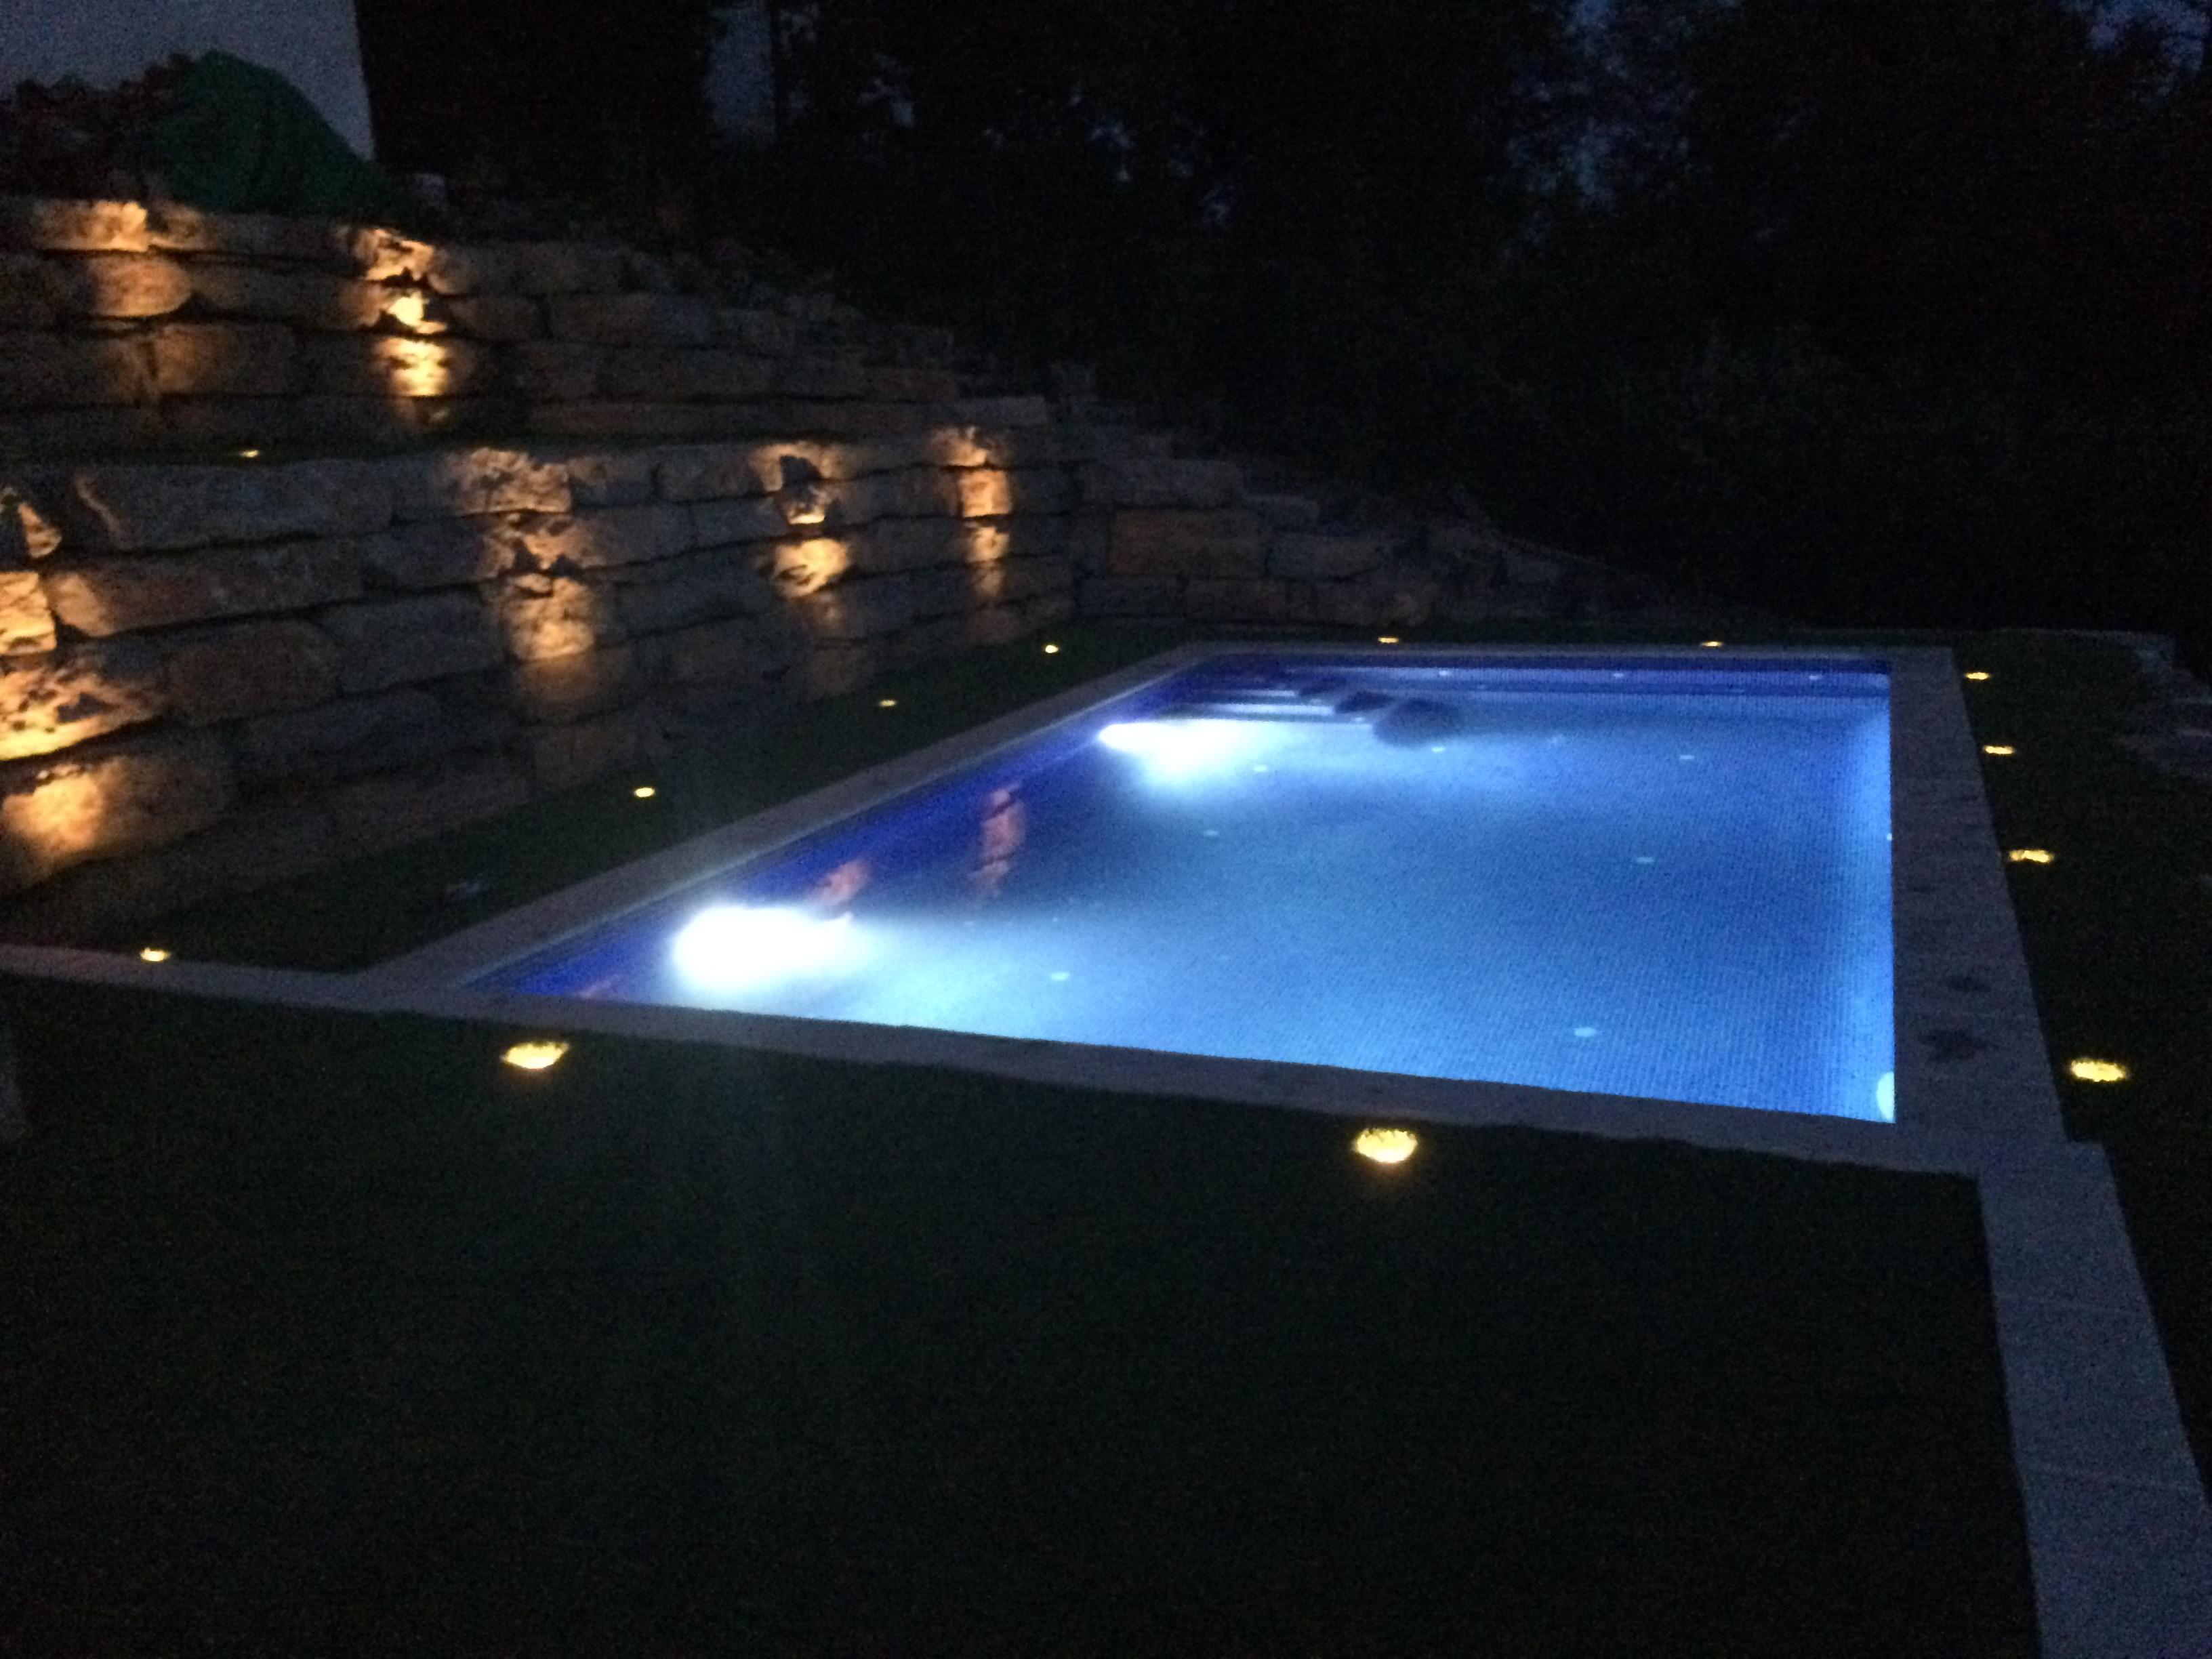 Construcci n piscina en riells i viabrea piscinas aop for Iluminacion led piscinas